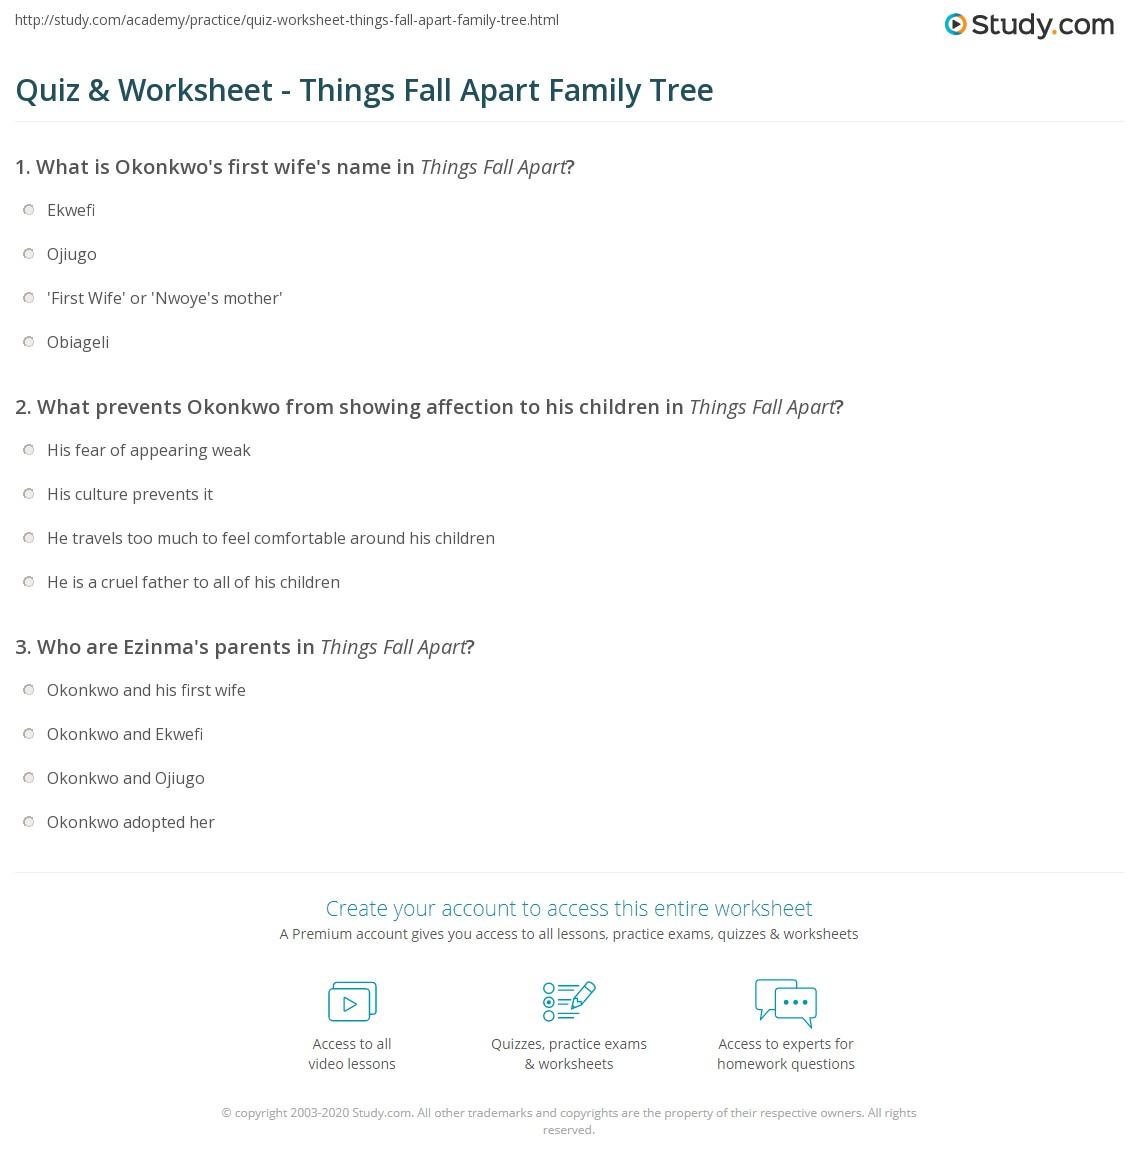 essay things fall apart okonkwo family tree